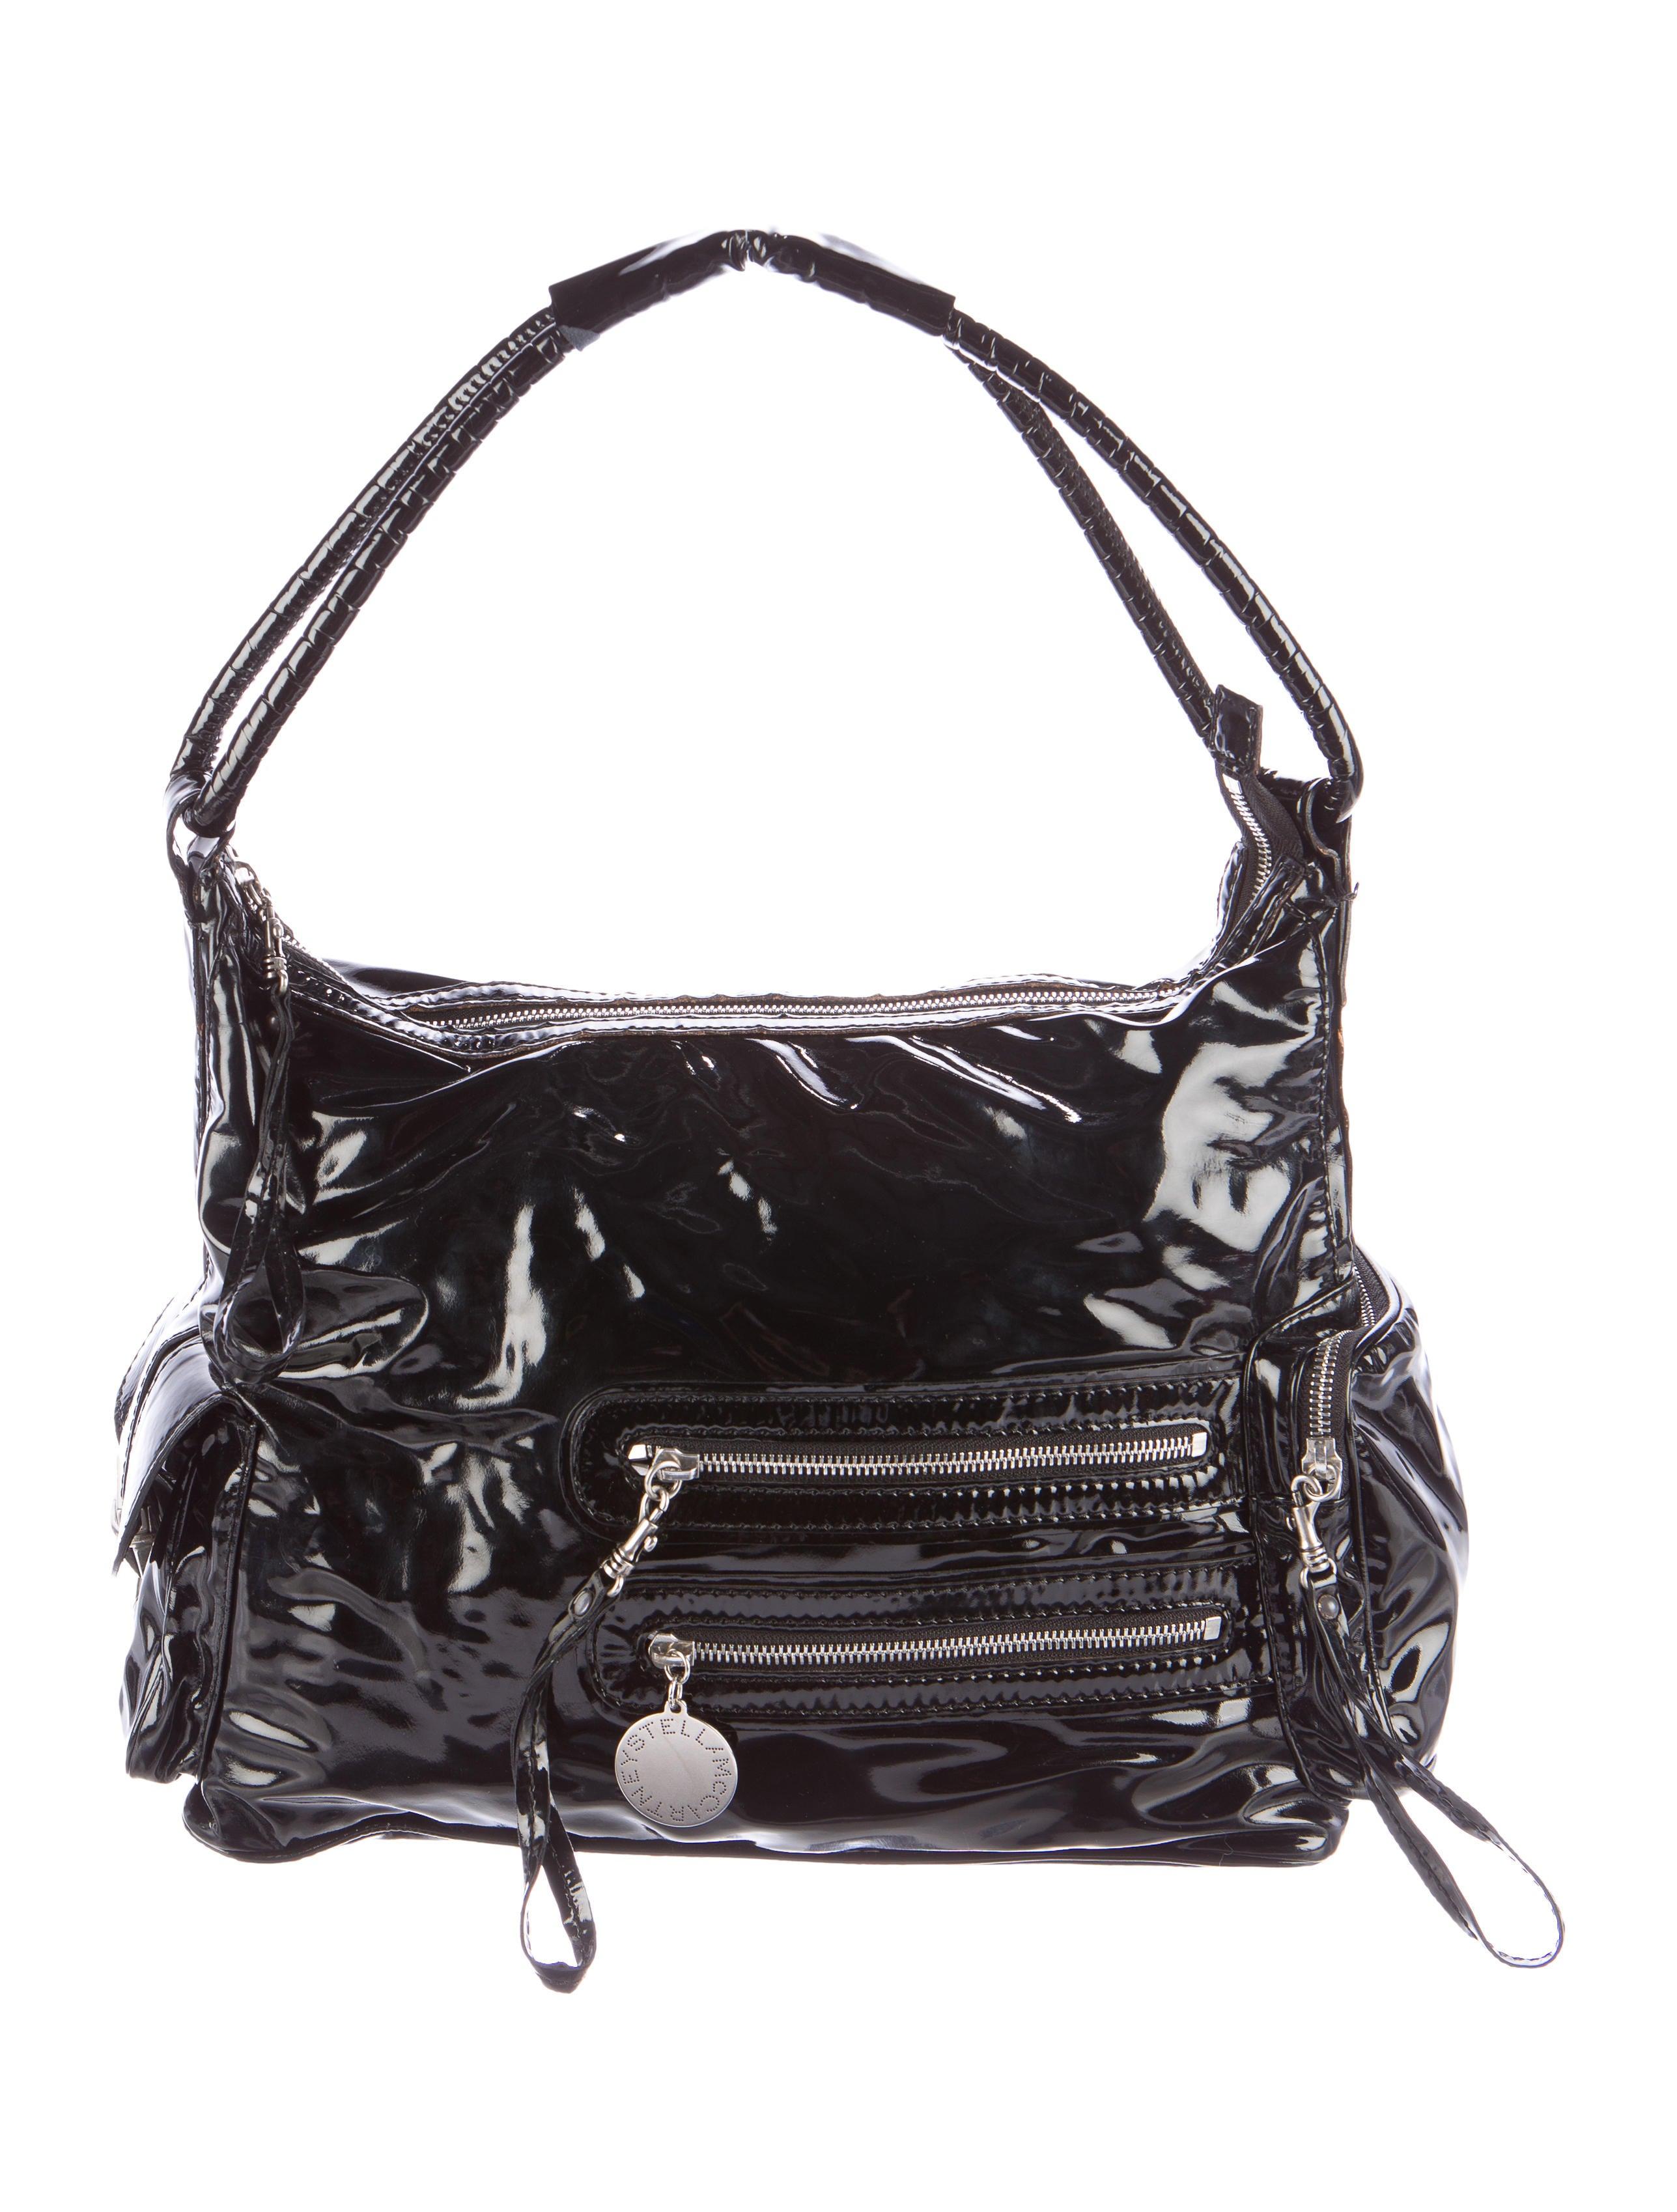 Stella Mccartney Glazed Vegan Leather Bag Handbags